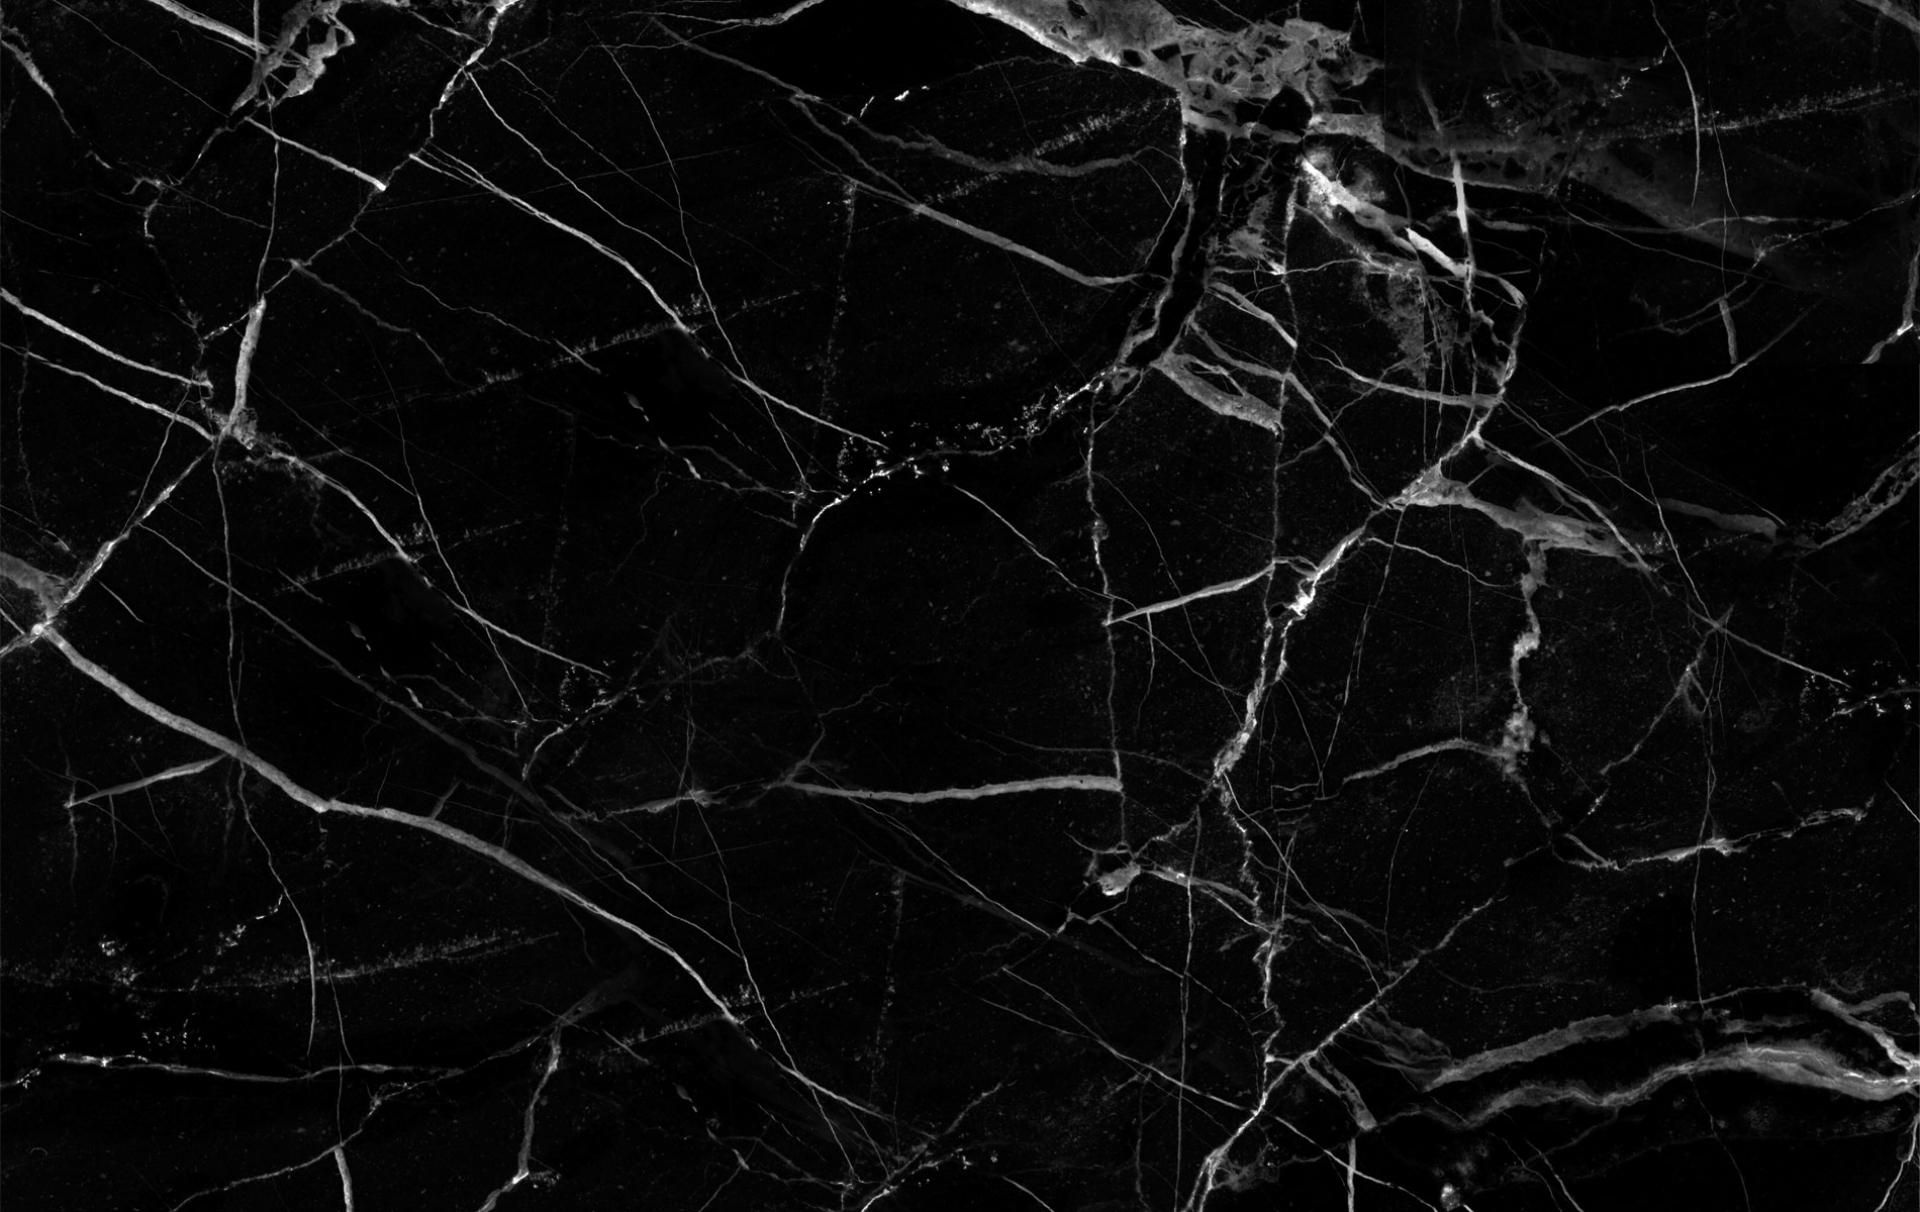 White Marble Wallpaper Hd Group Pictures 68 Dekorasi Teknologi Pendidikan Laptop